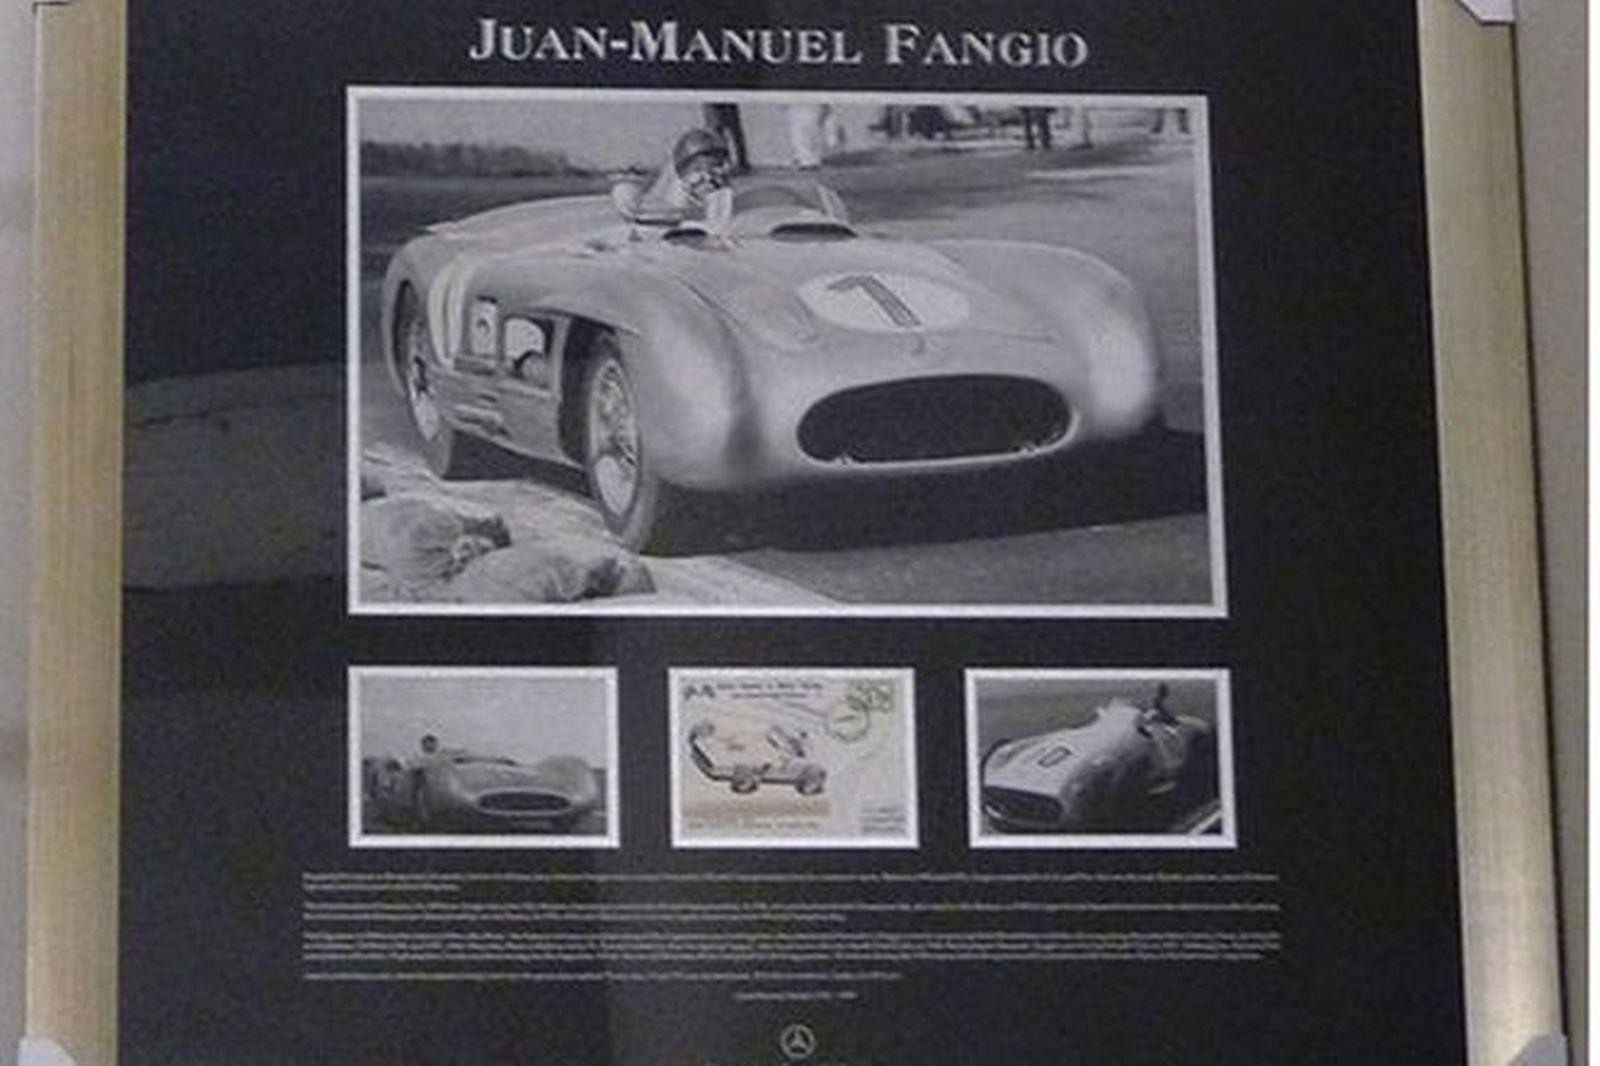 Framed Prints - Juan-Manual Fangio driving for Mercedes-Benz